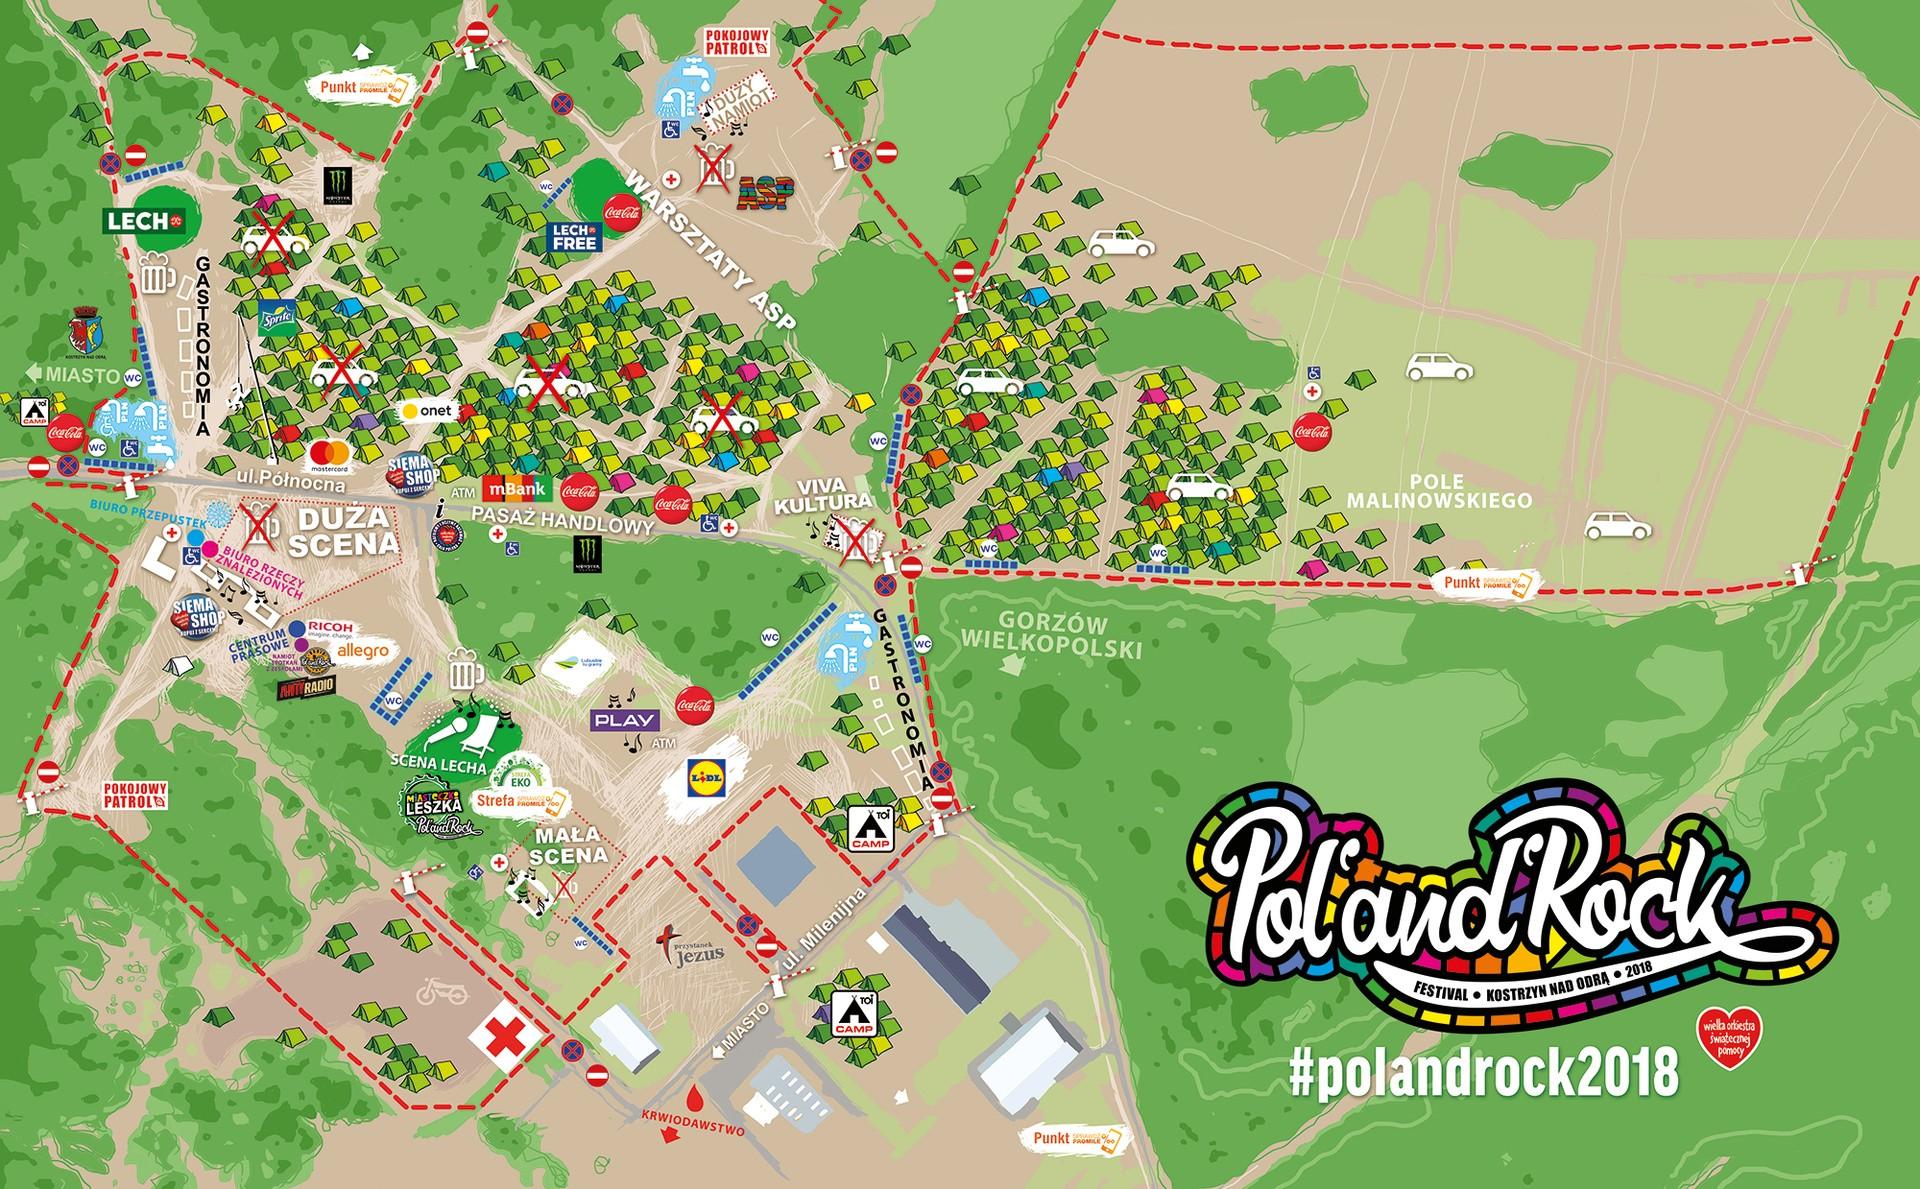 Mapa 24. PolAndRock Festiwalu (Przystanku Woodstock 2018)